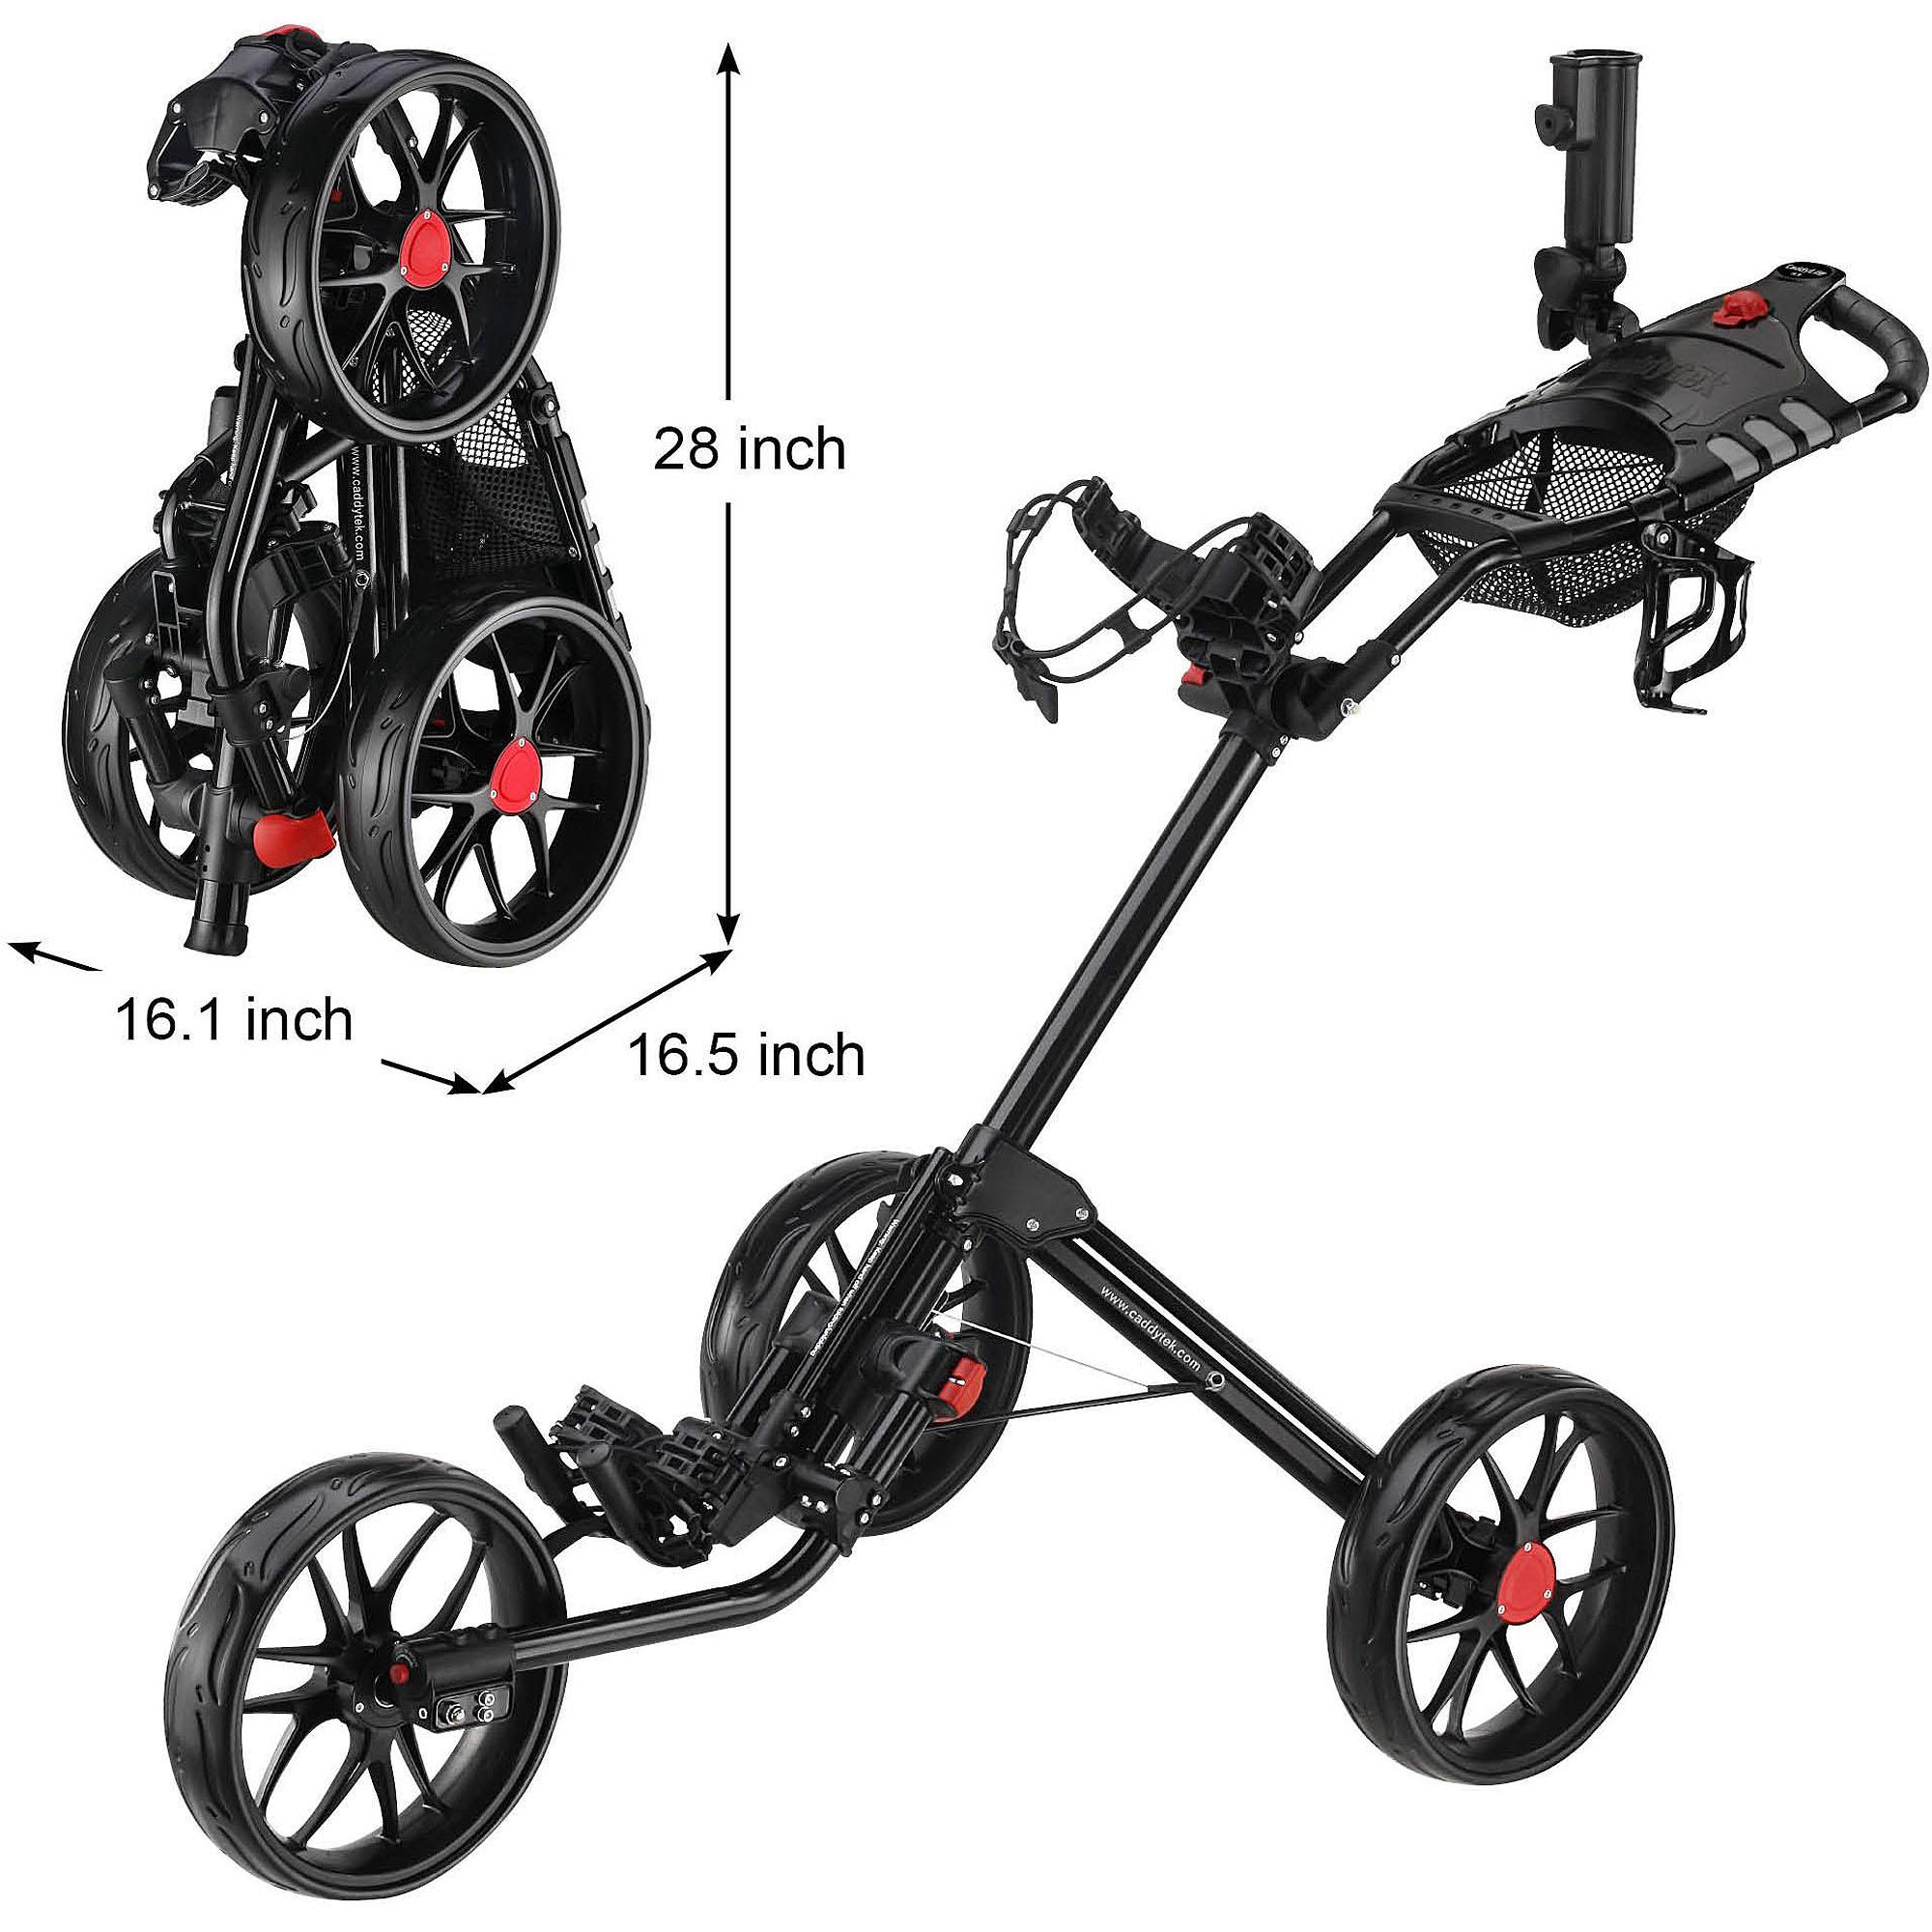 CaddyTek Super Deluxe Quad-Fold Golf Push Cart, Black